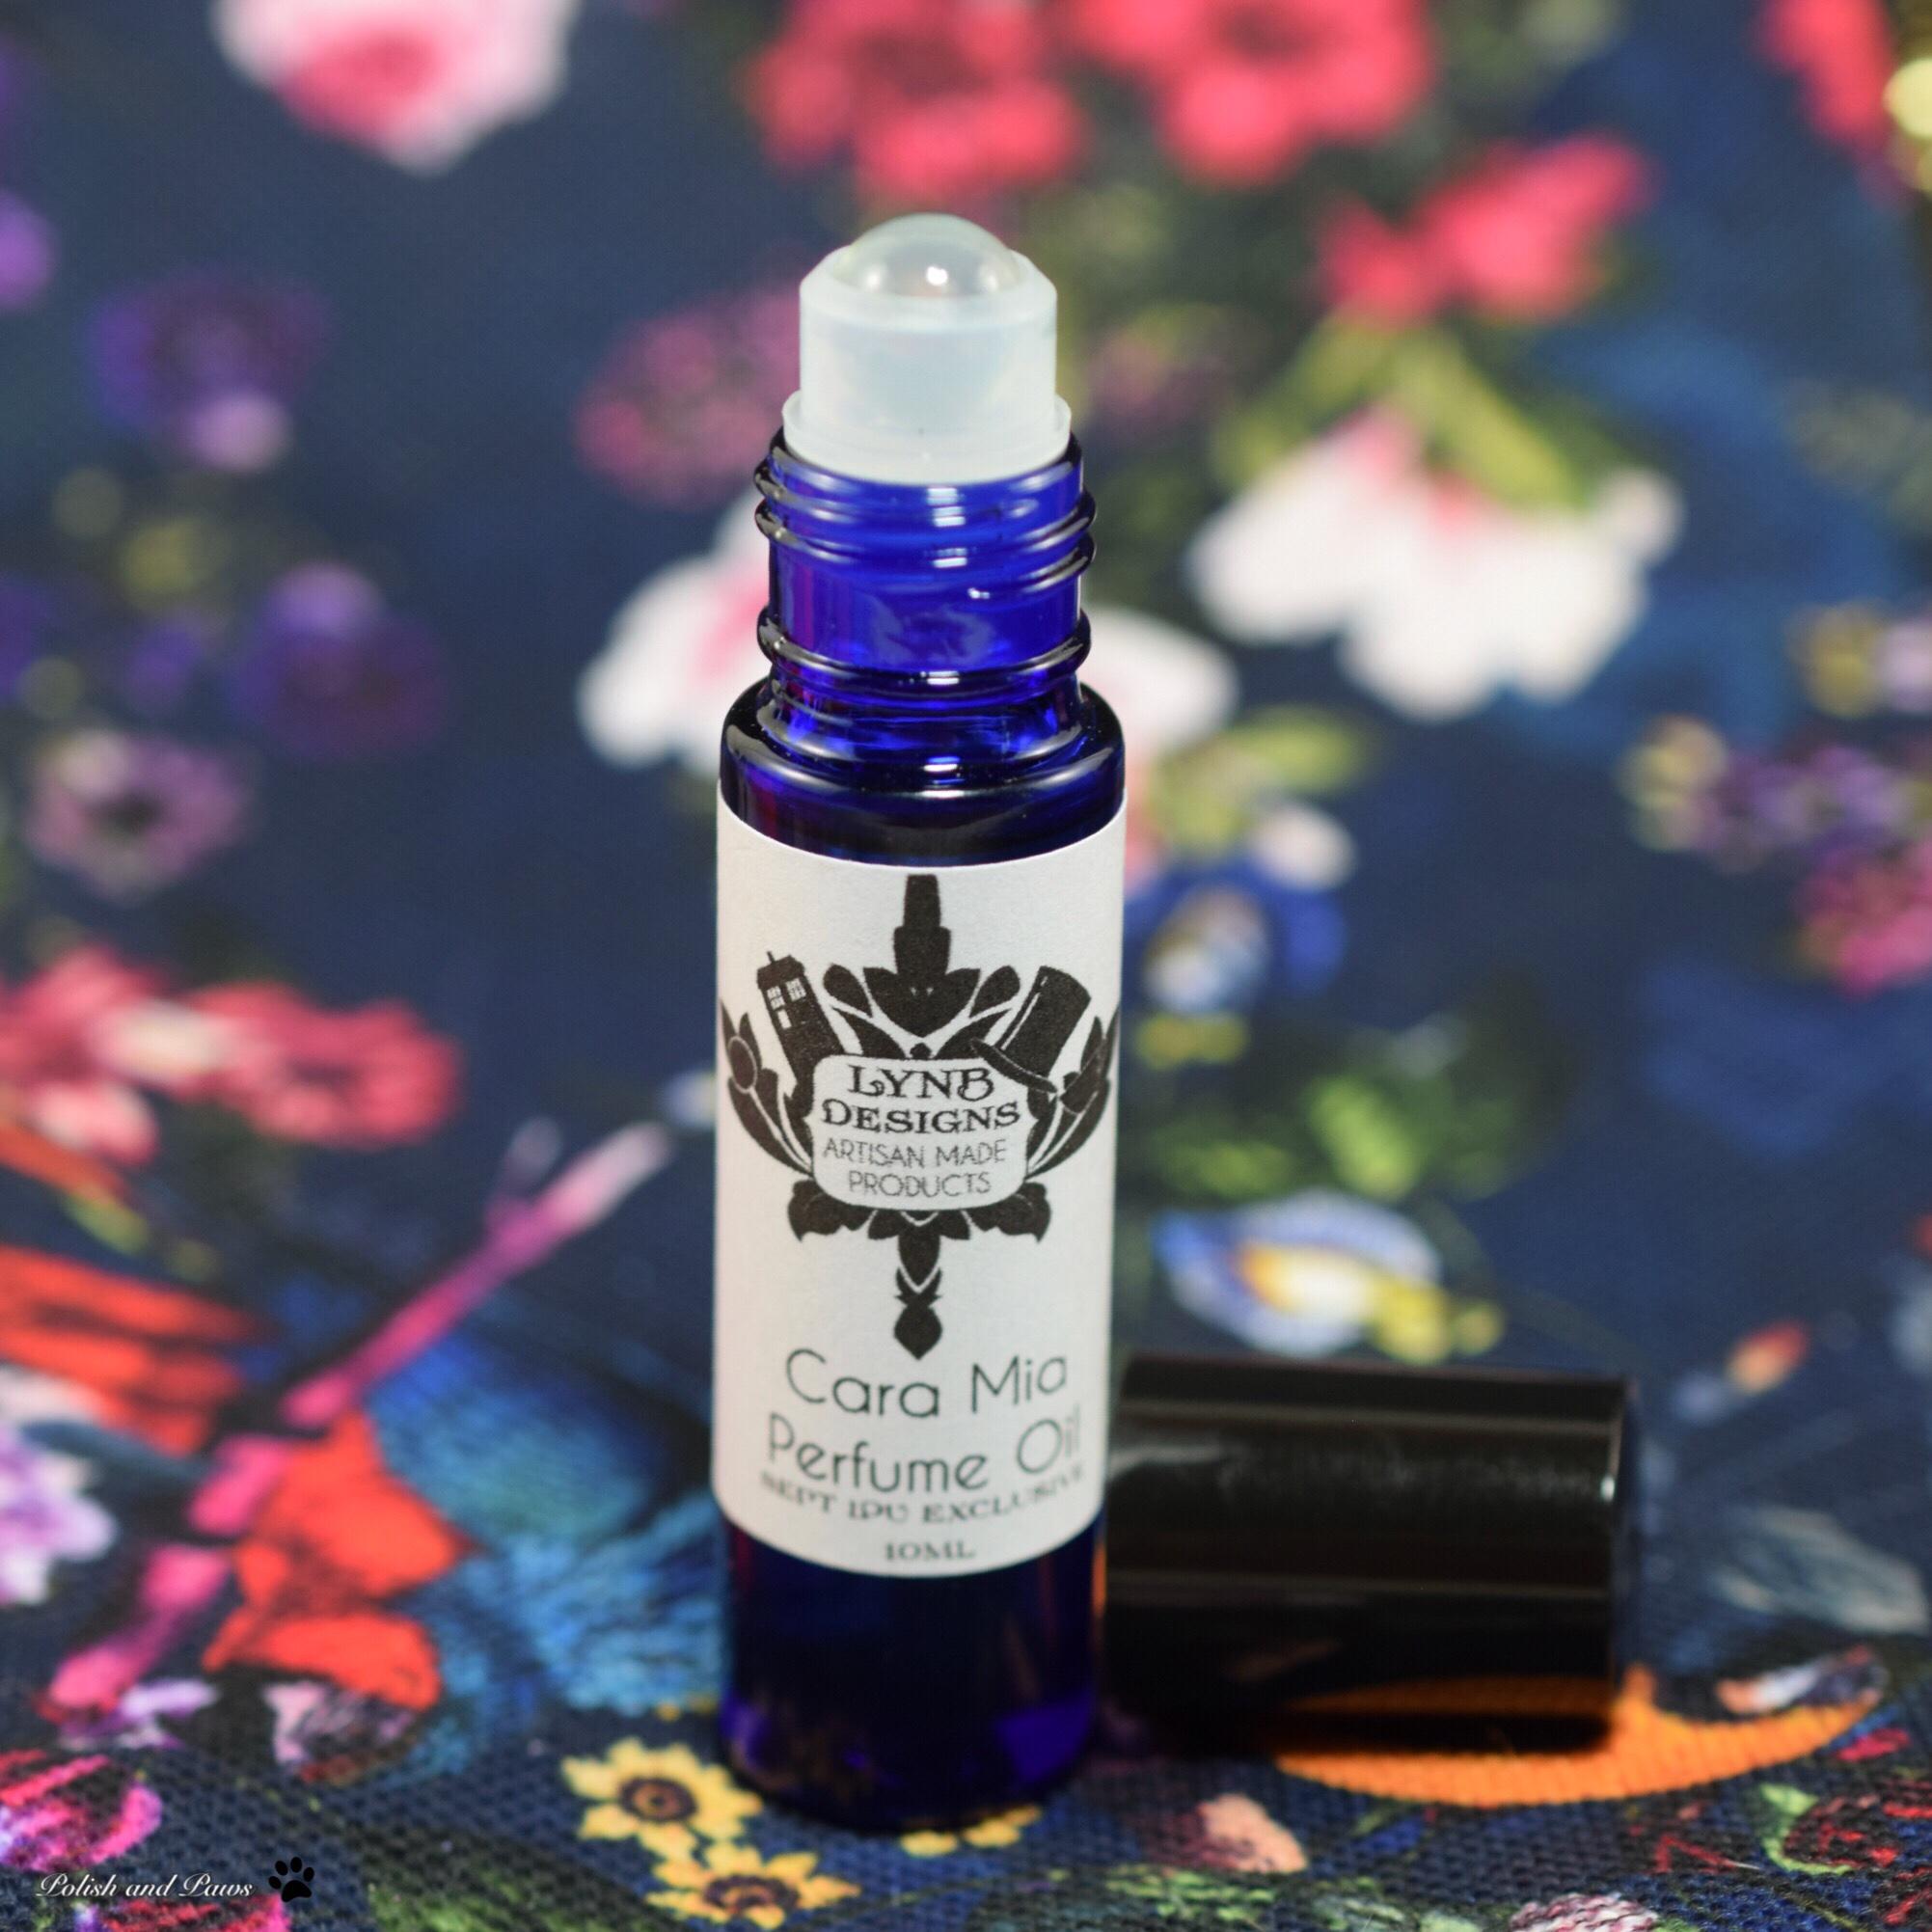 LynB Designs Cara Mia Perfume Oil